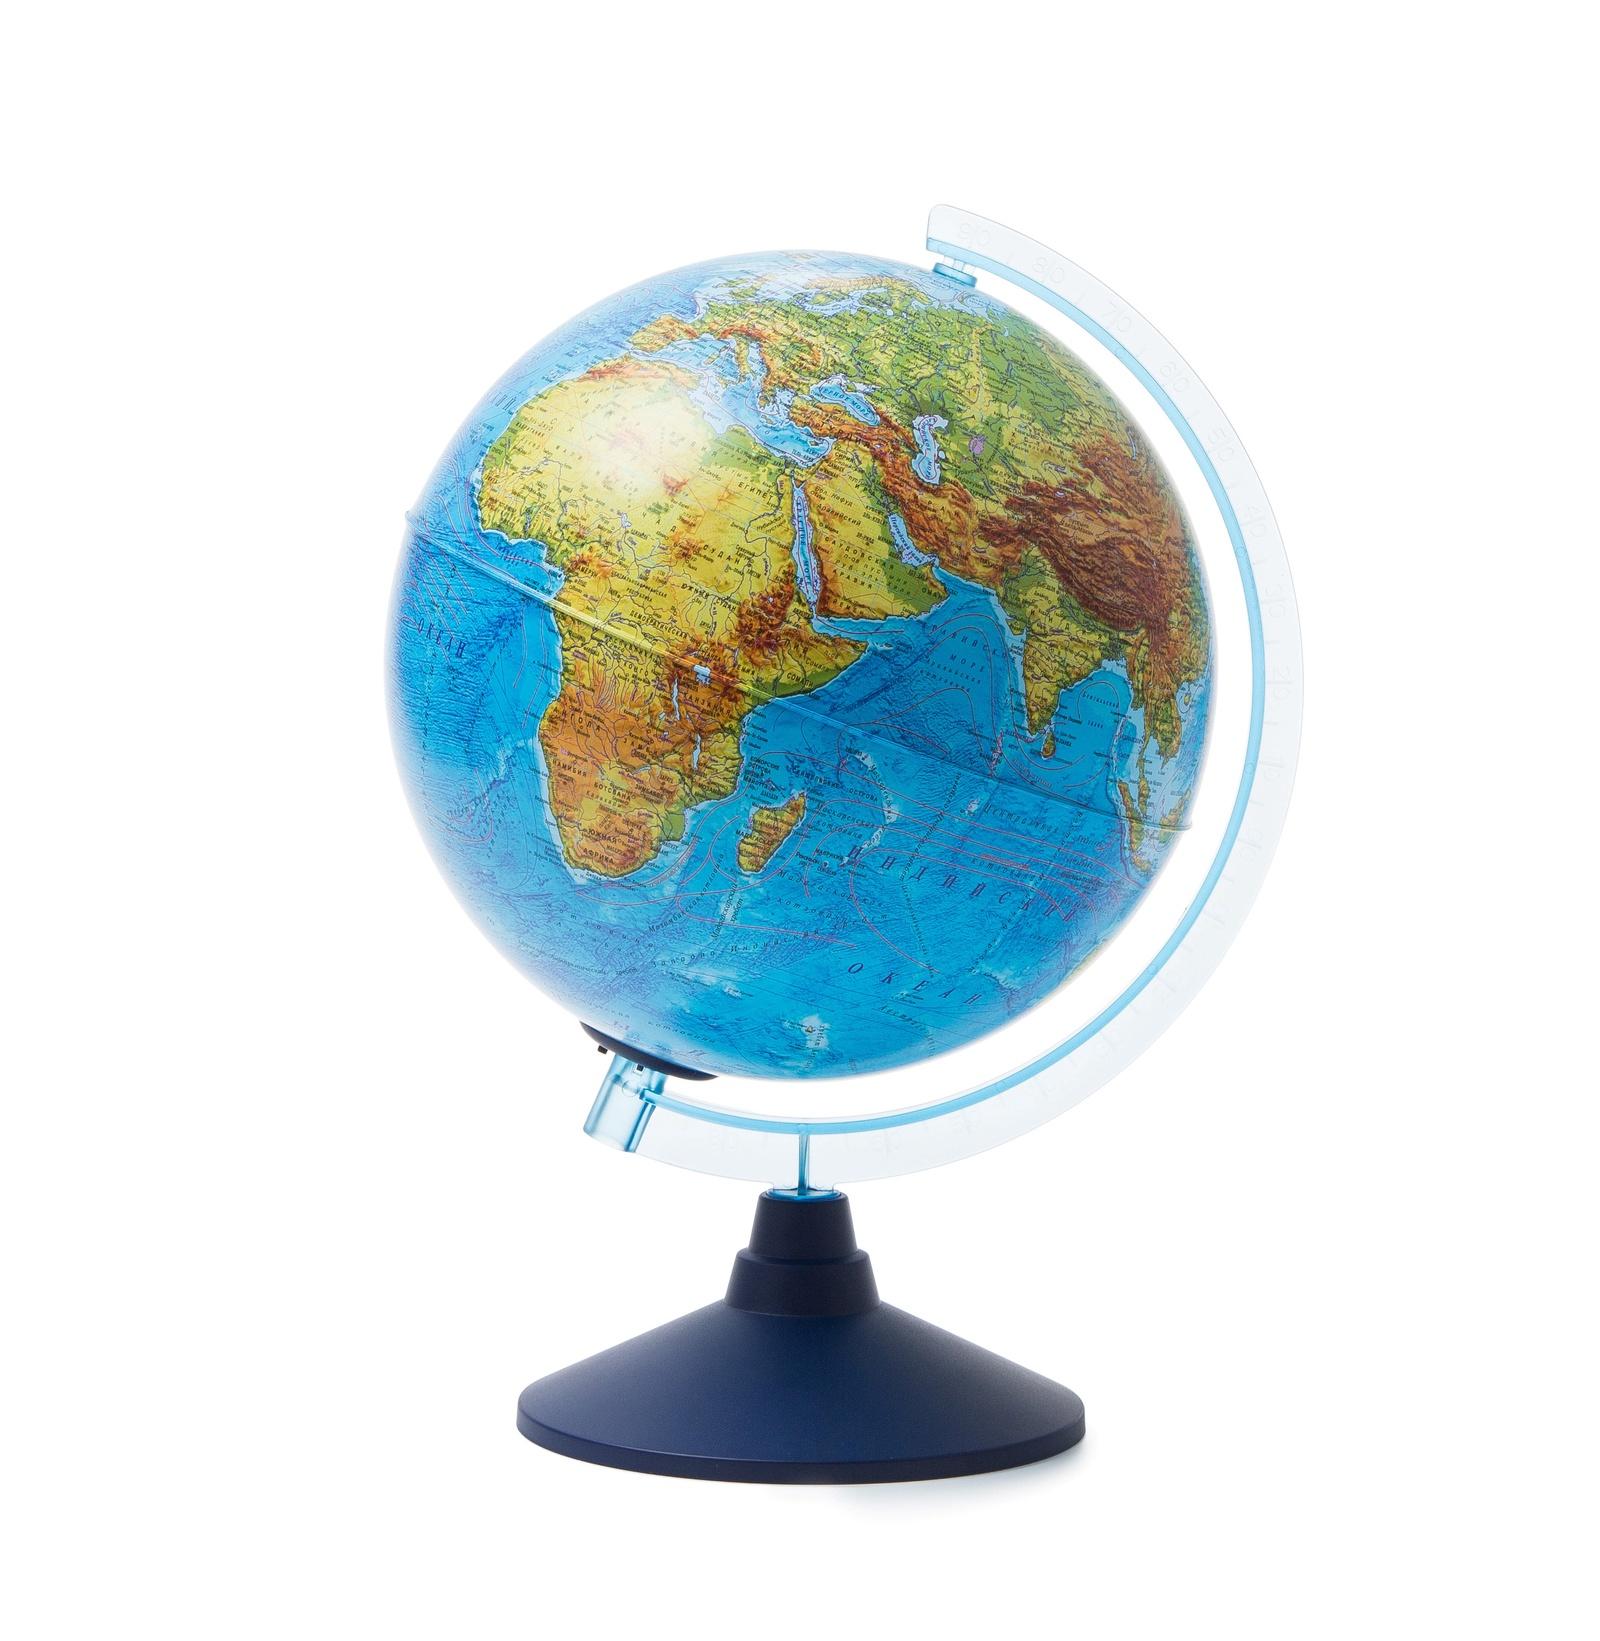 Глобус Globen Земли физико-политический с подсветкой на батарейках, диаметр 25 см цена 2017